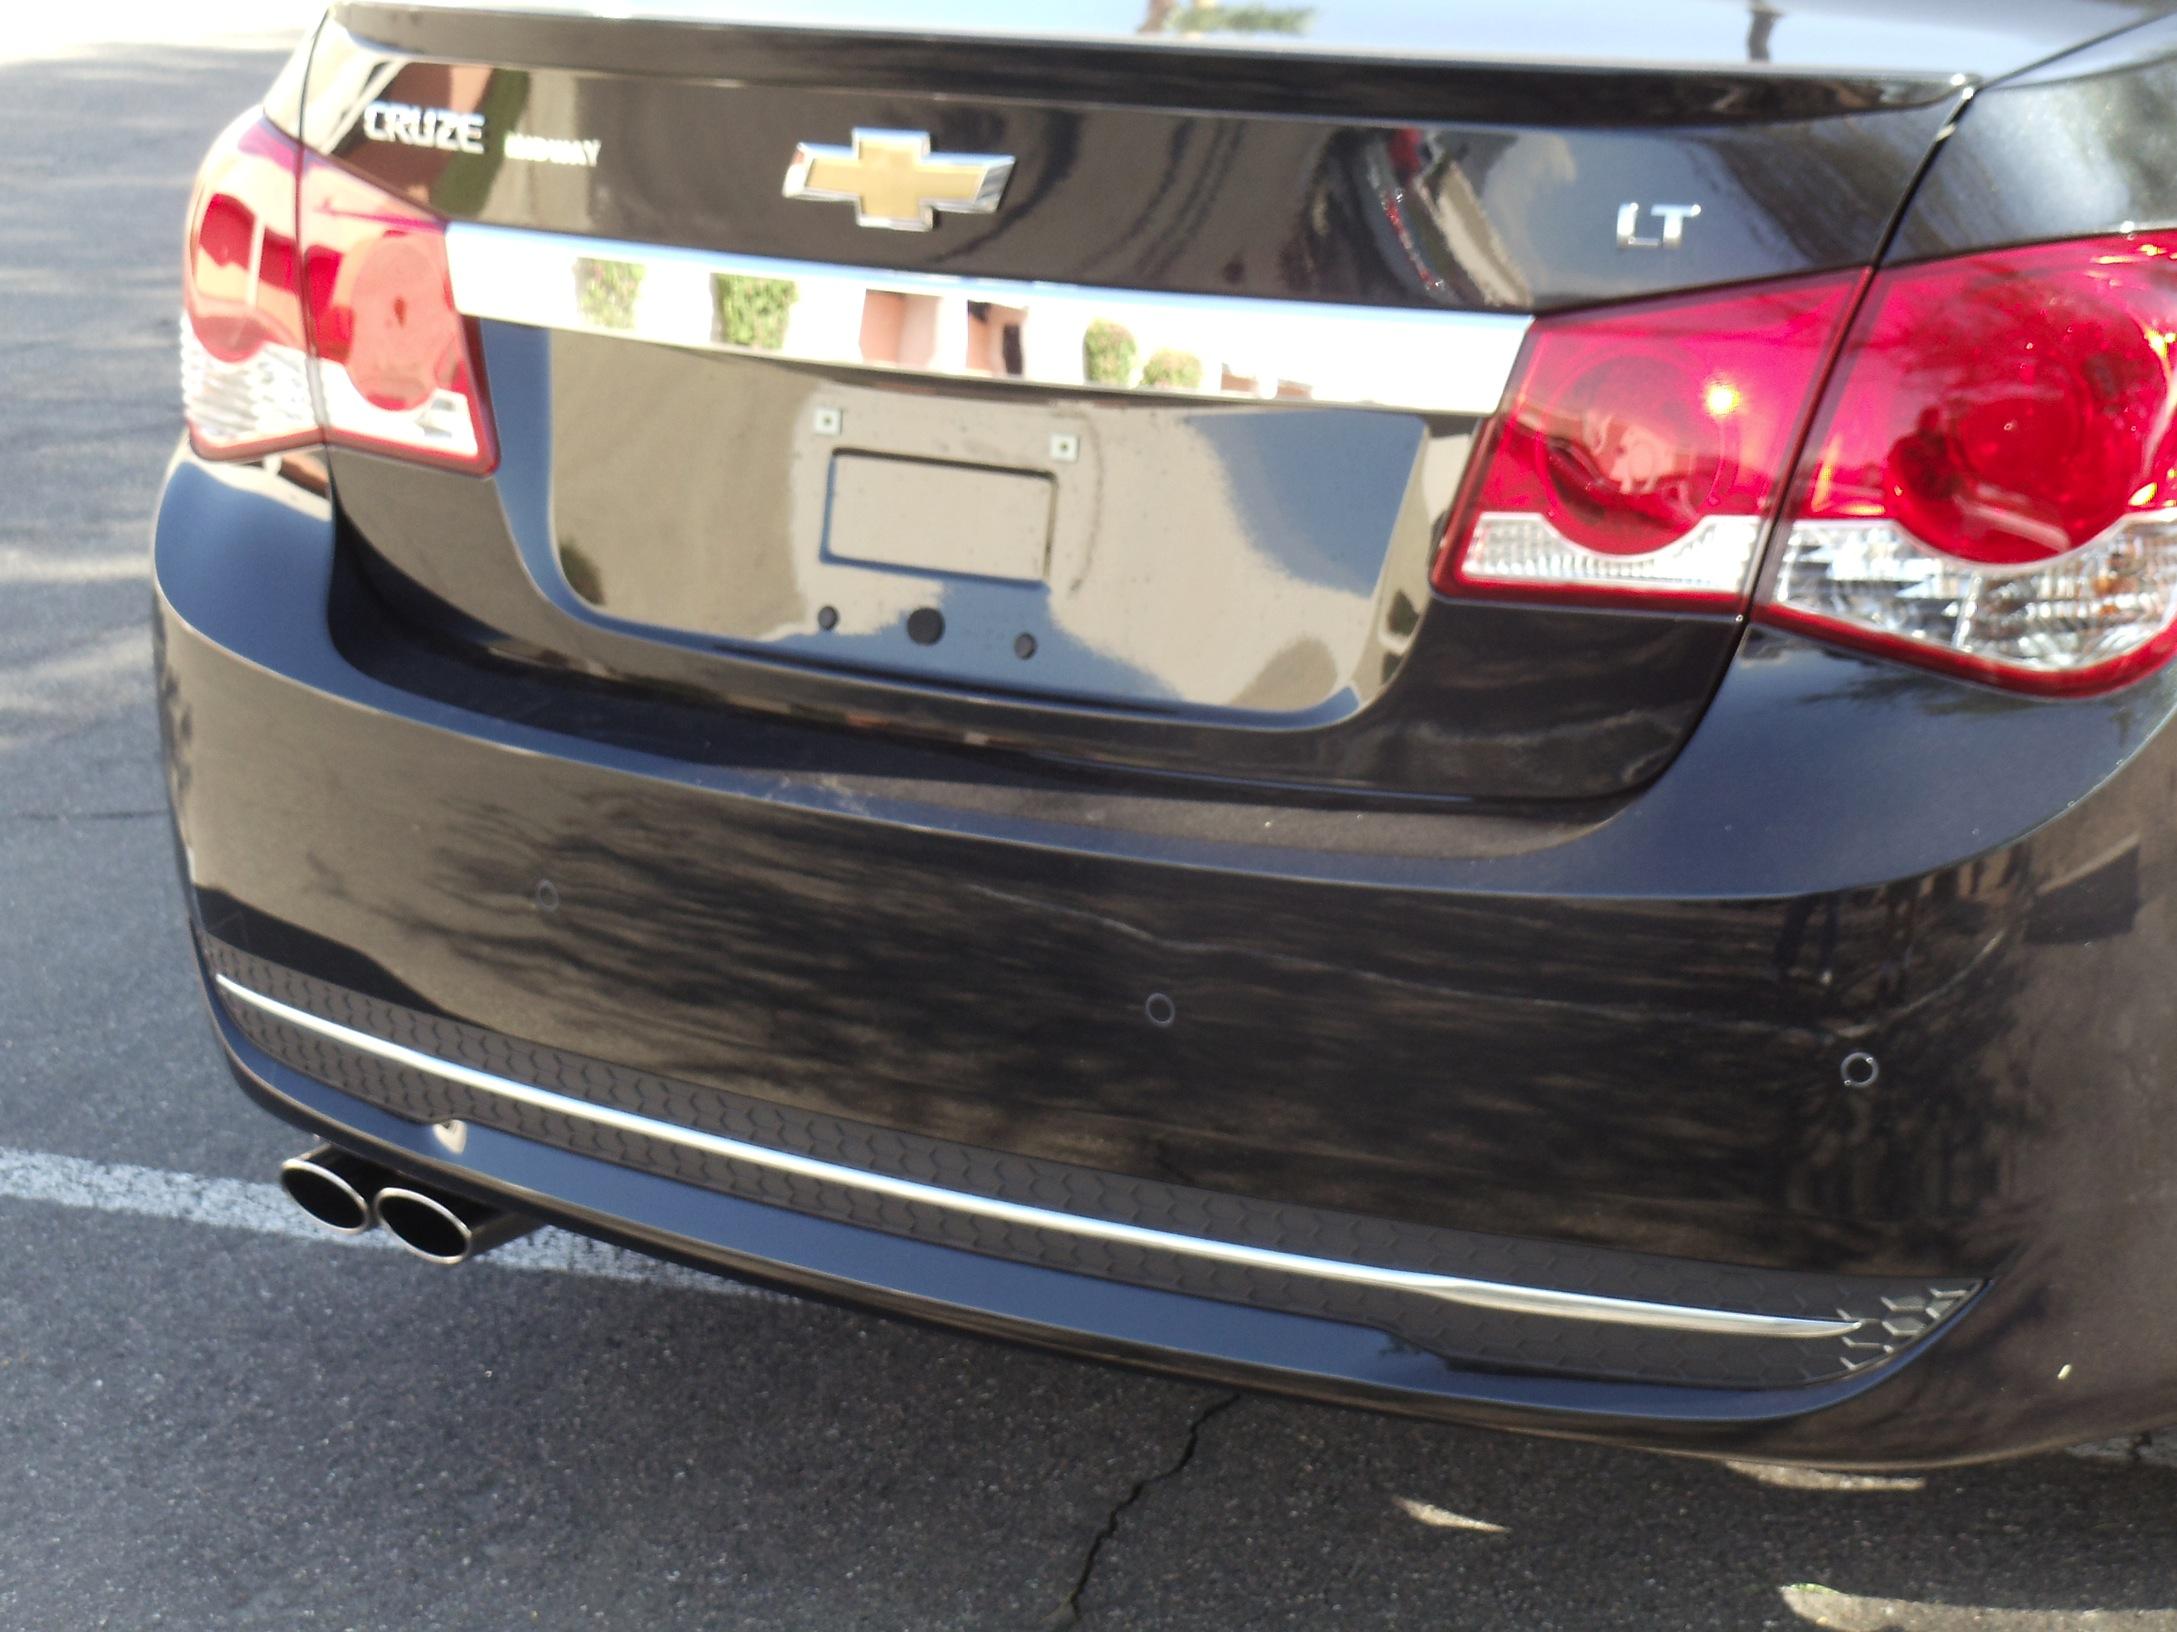 Chevy Cruze Axle Back Exhaust Korkar Performance Engineering